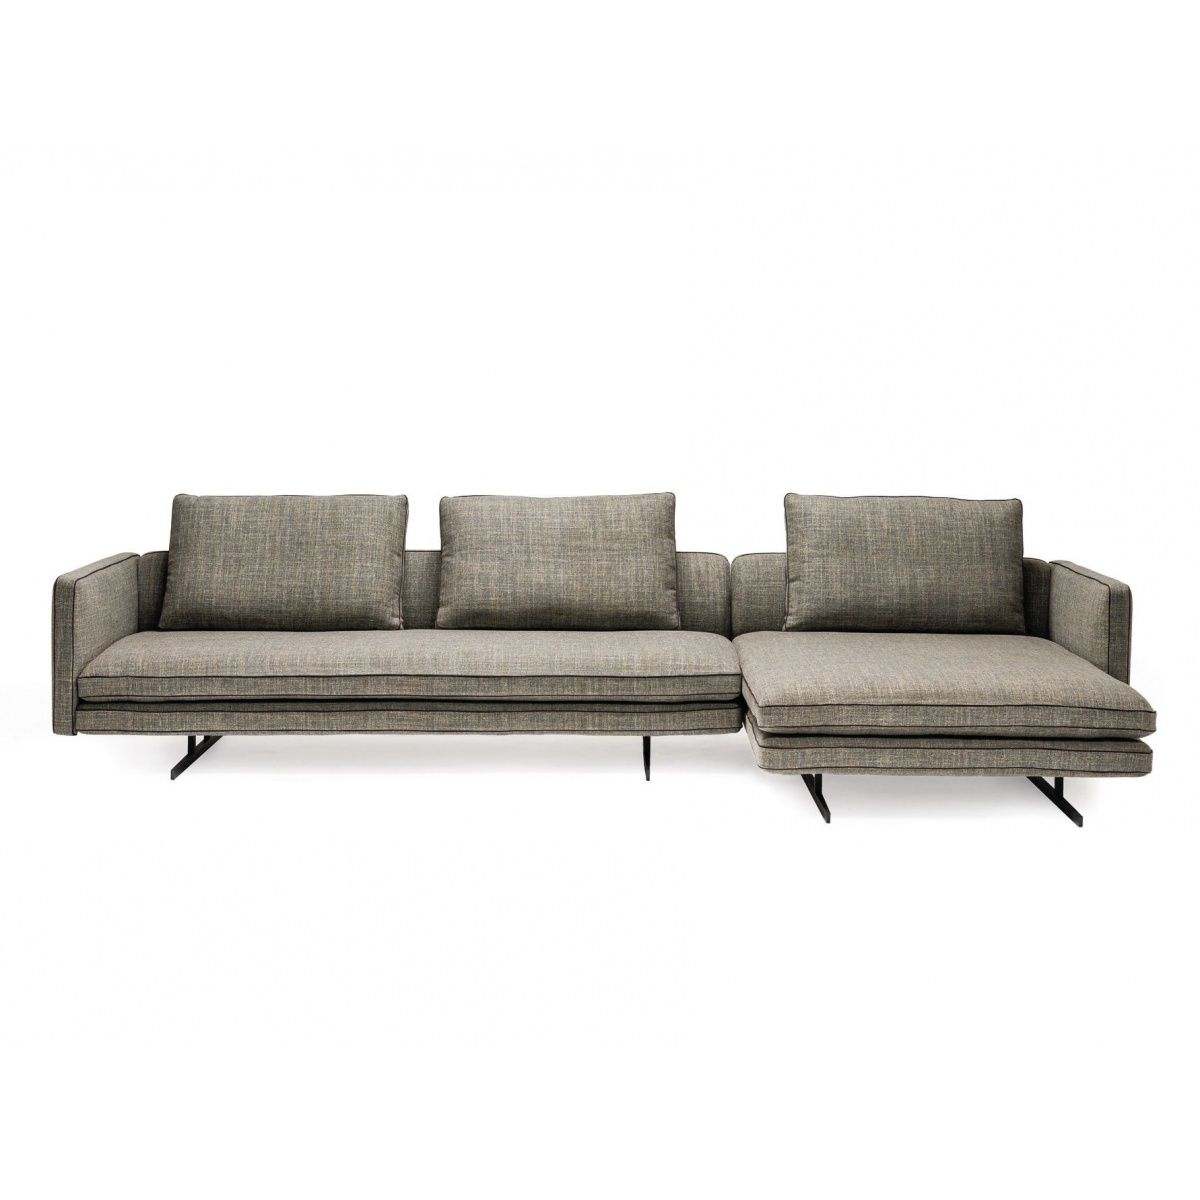 Hoekbank Chaise Lounge.Moss Hoekbank Chaise Longue Design Banken Pinterest